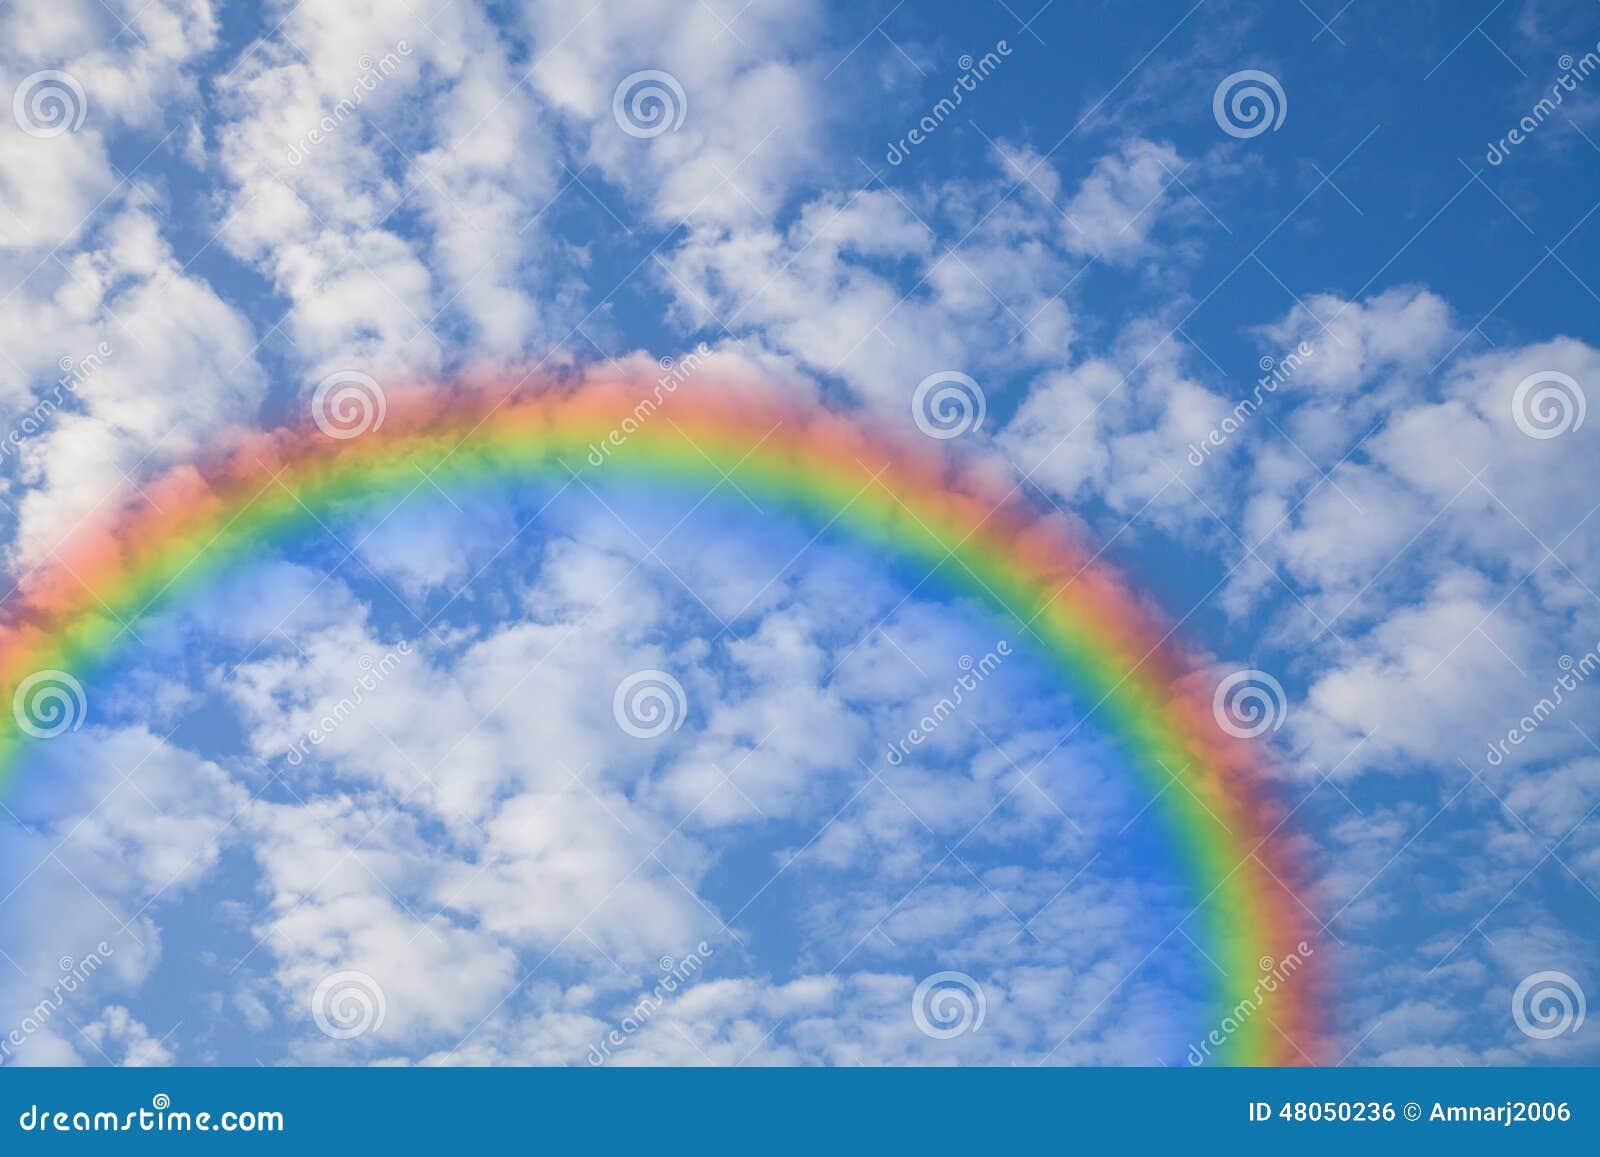 the natural phenomenon rain Rain, refraction, dark, green, red, blue, colorful, yellow, double rainbow, climate,  thunderstorm, spectrum, spectacular, bent, meteorology, natural phenomenon,.